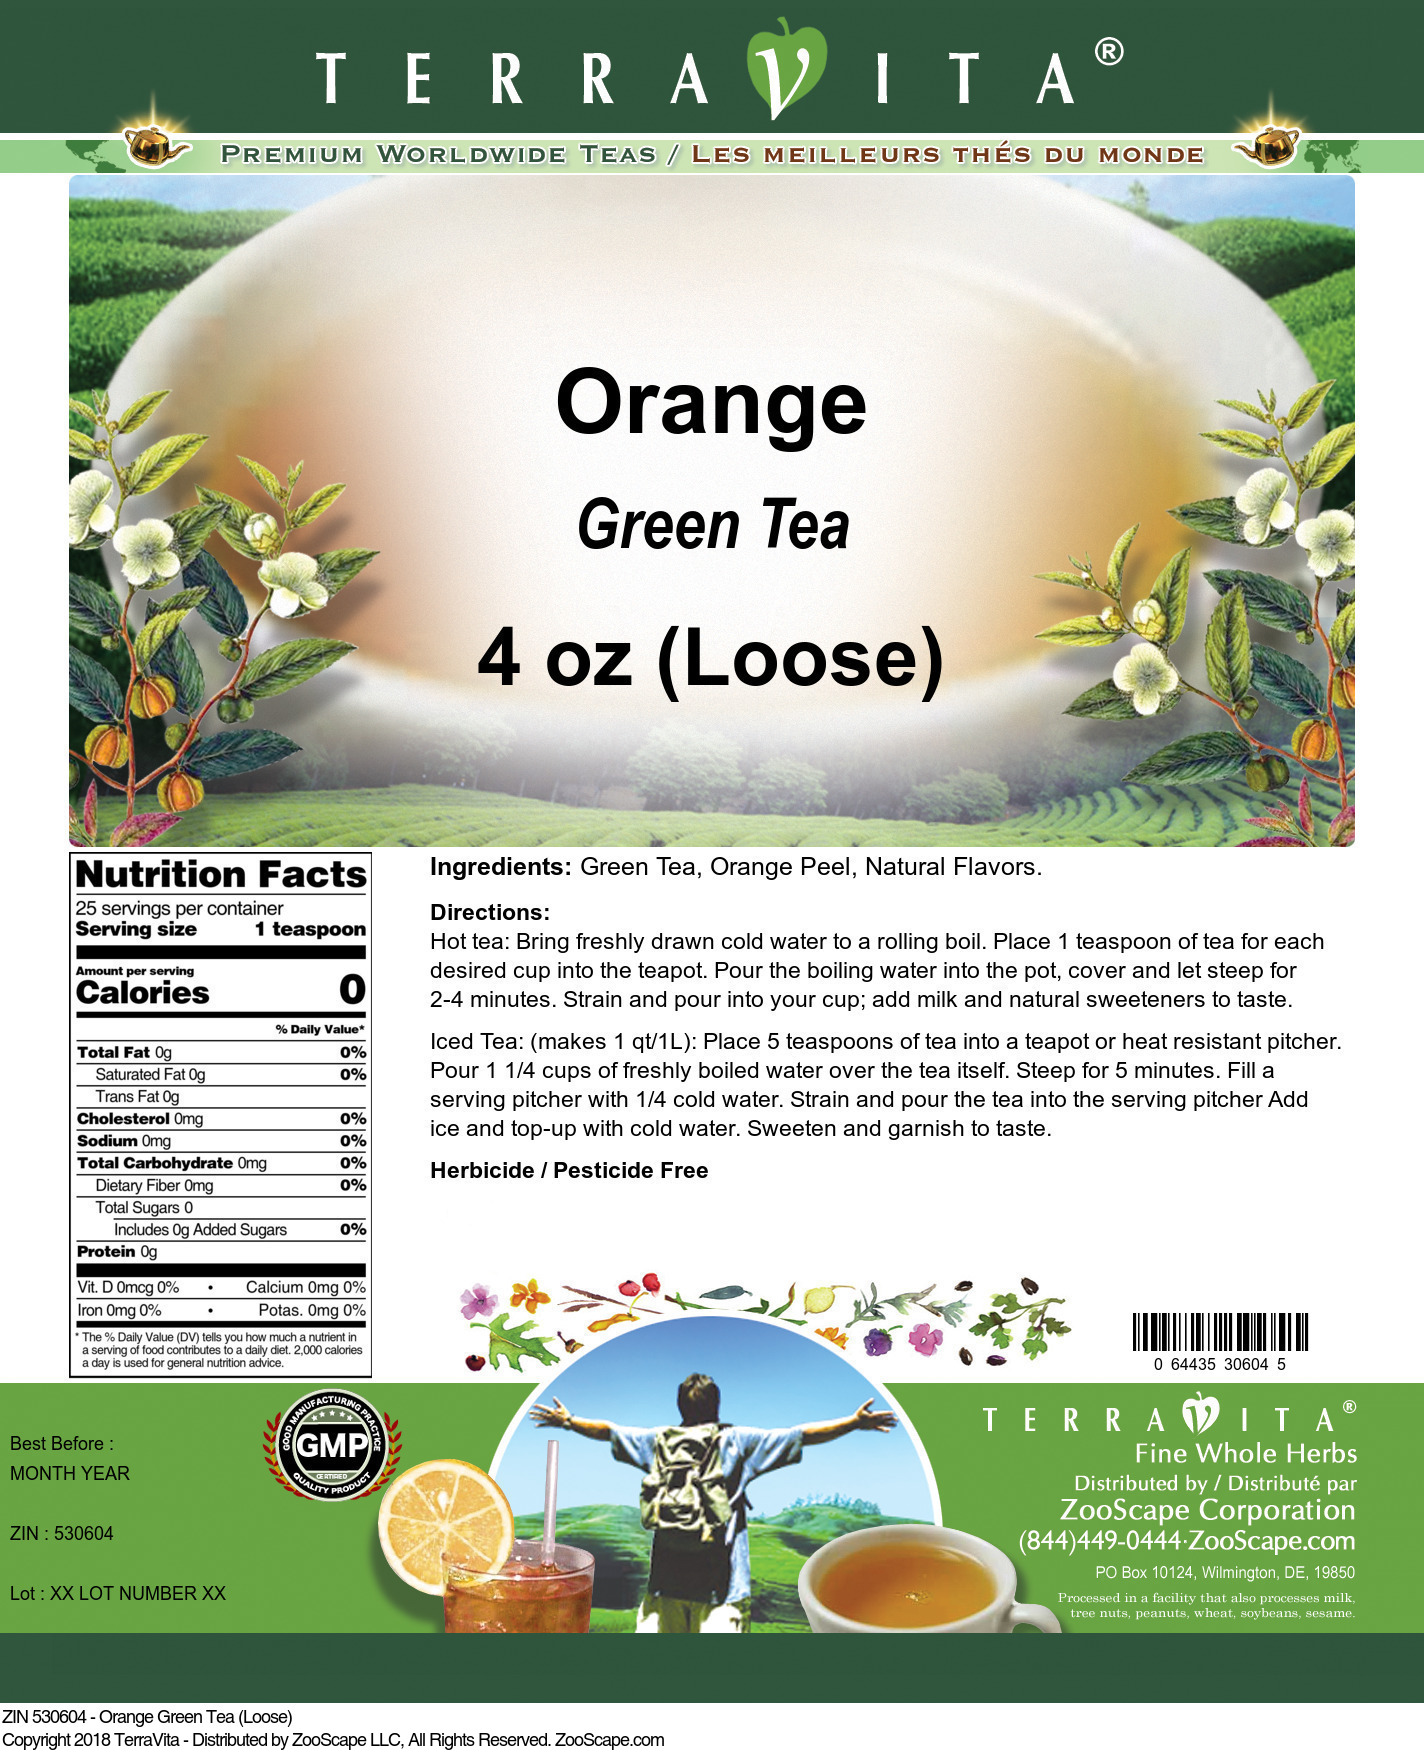 Orange Green Tea (Loose)